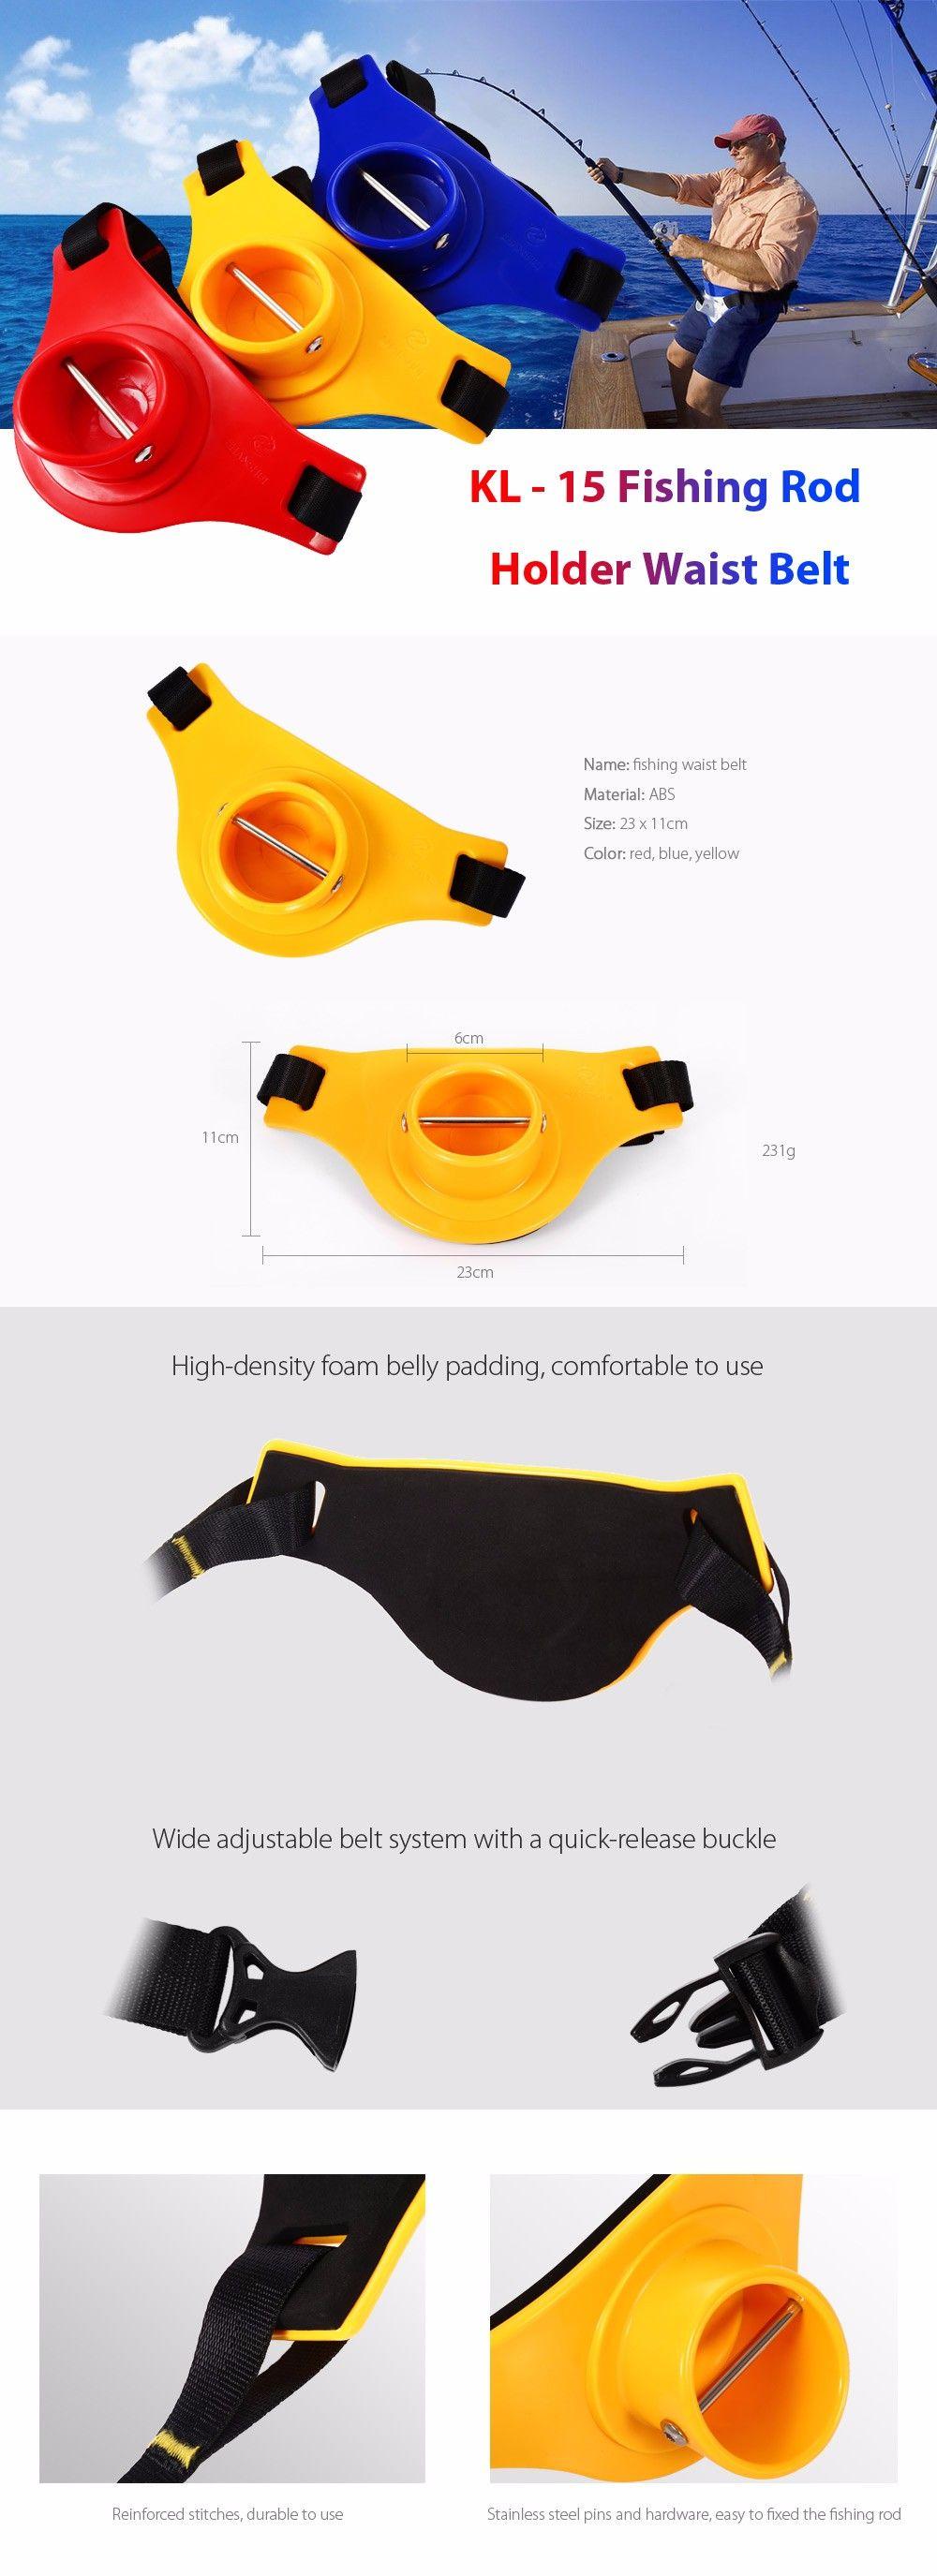 KL - 15 Portable ABS Fishing Rod Holder Waist Belly Belt for Fisherman